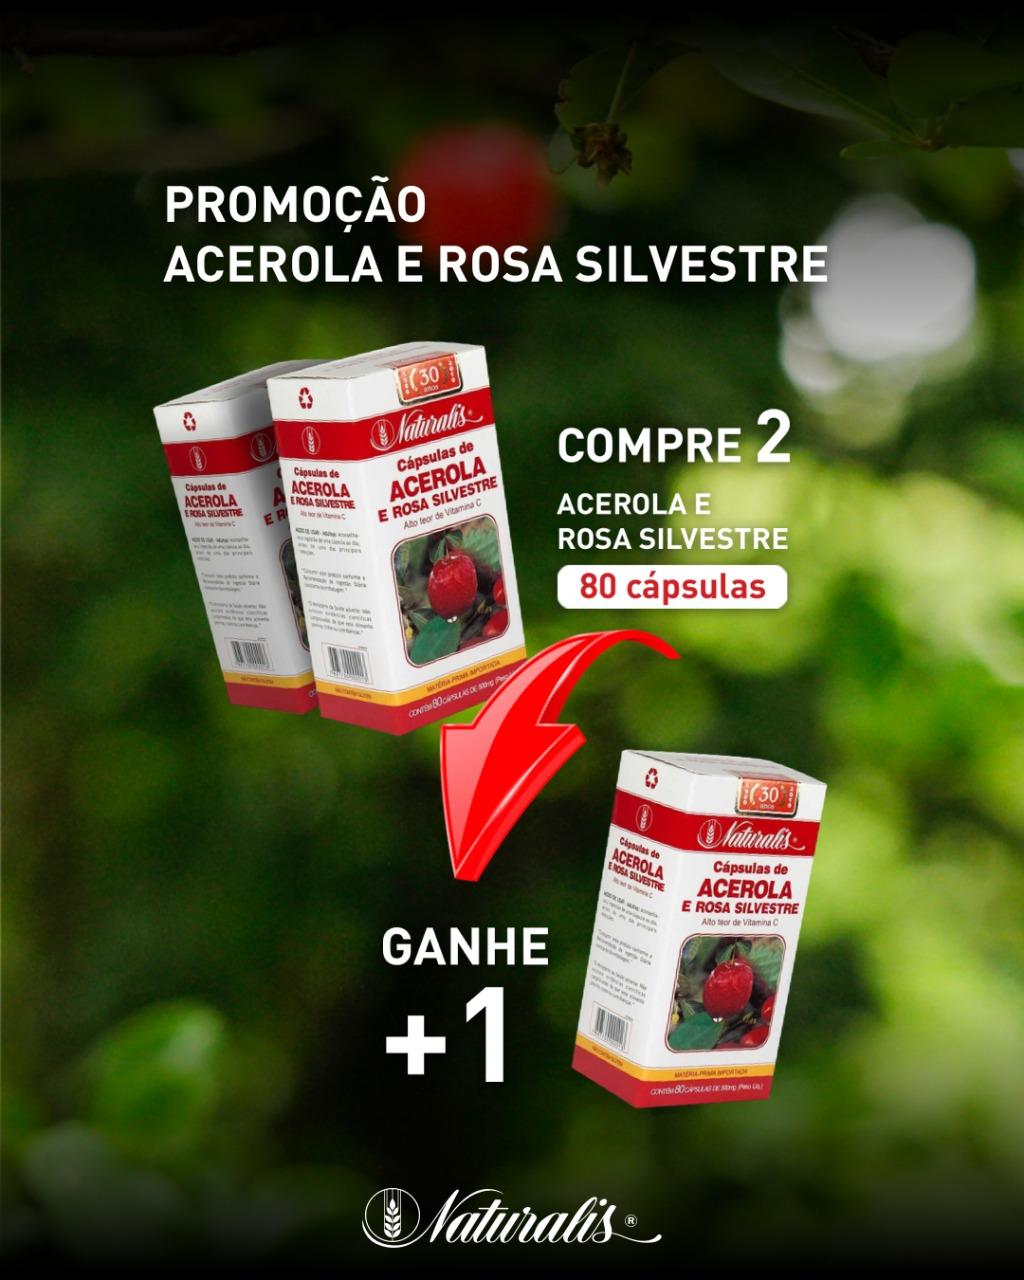 Kit 2 unidades Acerola e Rosa Silvestre Naturalis 80 Cápsulas ganhe + 1 unidade